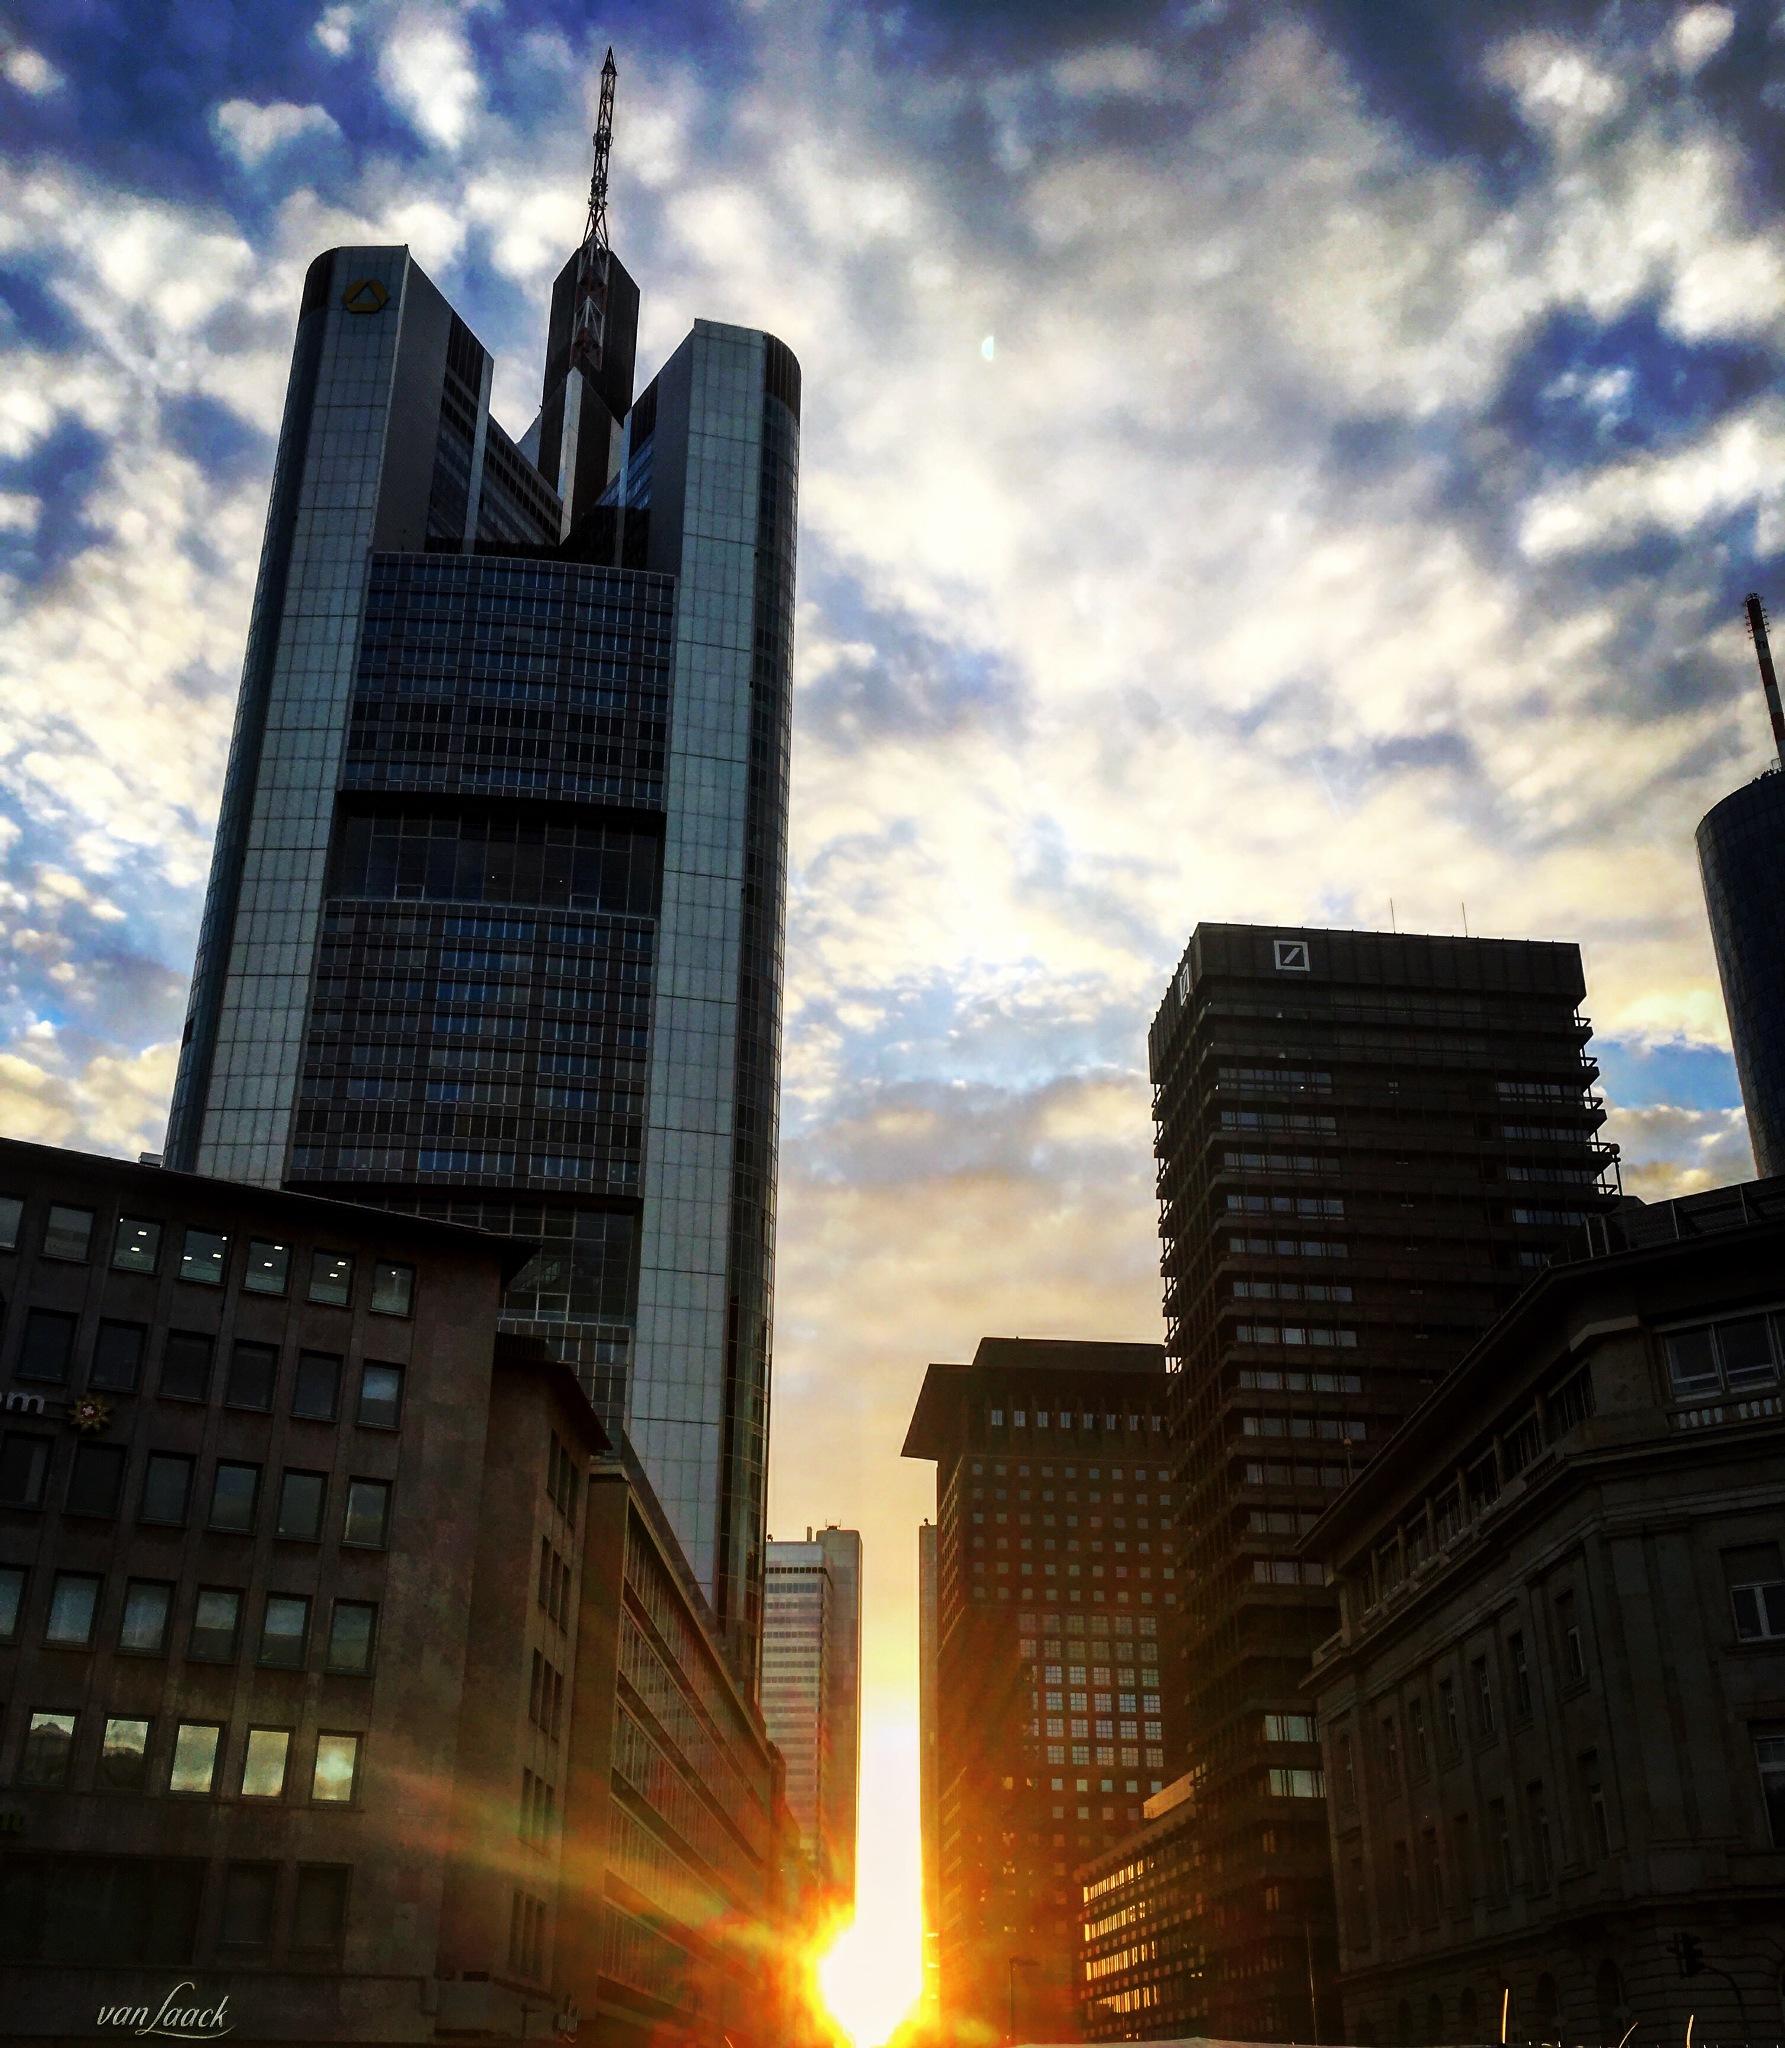 Sunset in Frankfurt / Germany  by Clarissa Altmann